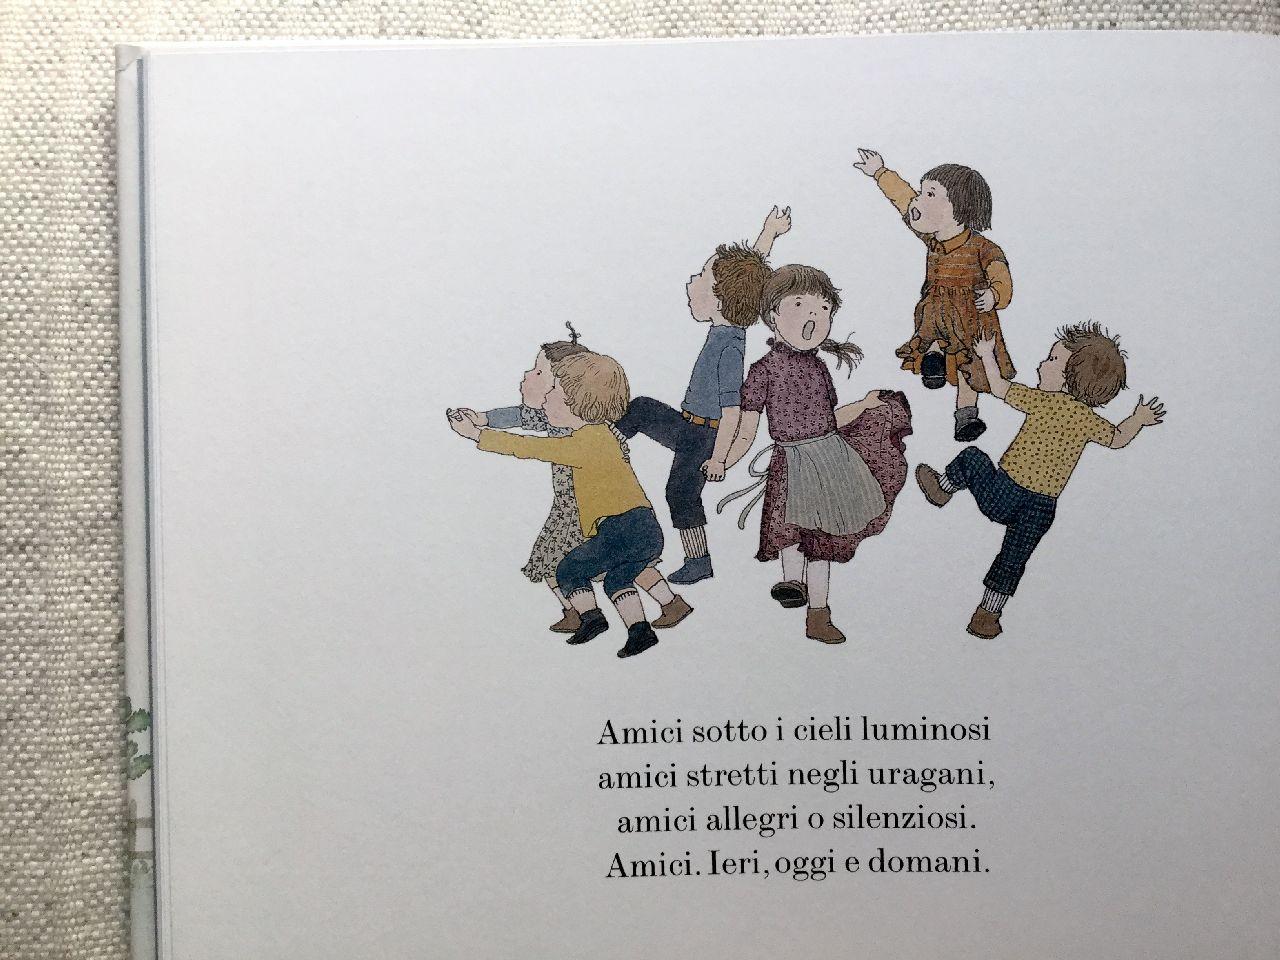 Satomi Ichikawa, Amici, Orecchio acerbo